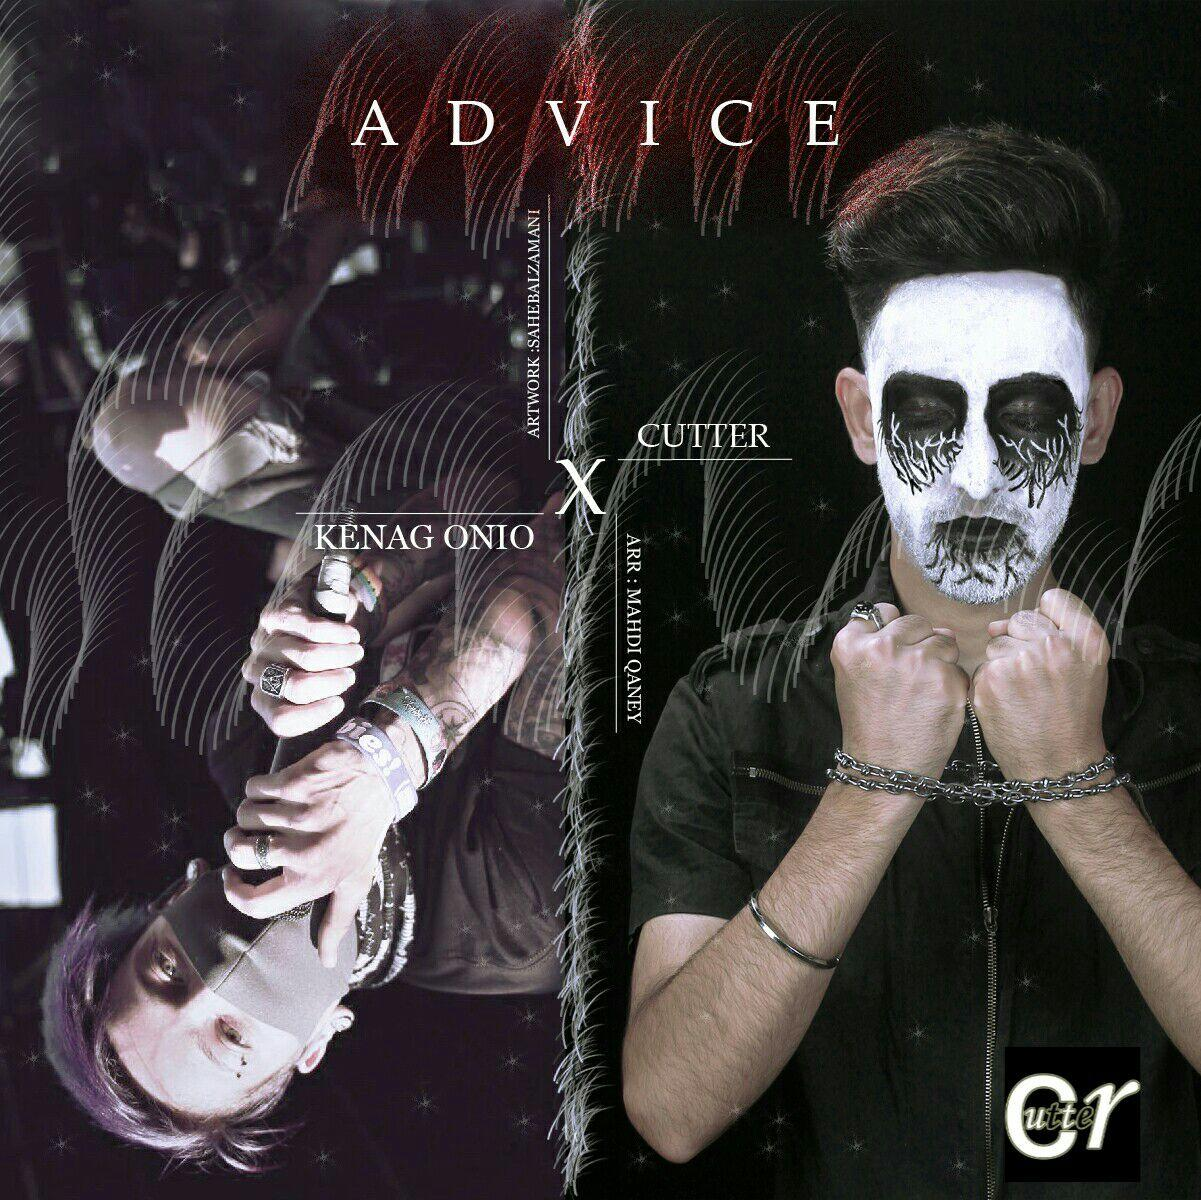 Cutter – Advice (Ft Kenag Onio)